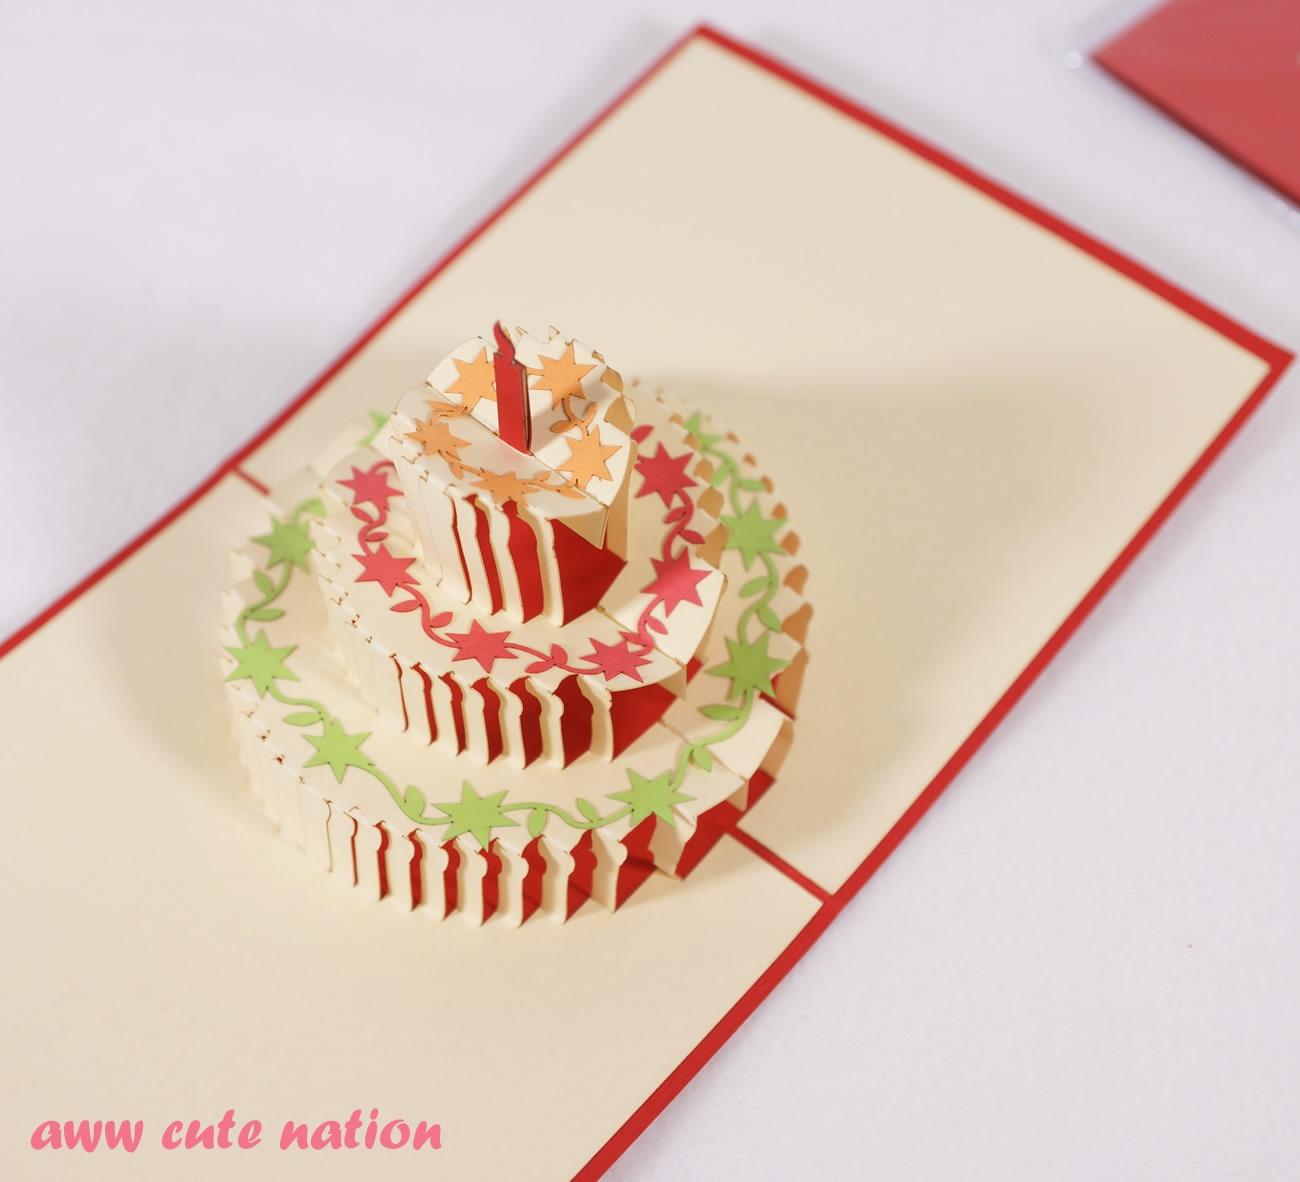 Awesome One Special Birthday Cake Aww Cute Nation Funny Birthday Cards Online Benoljebrpdamsfinfo